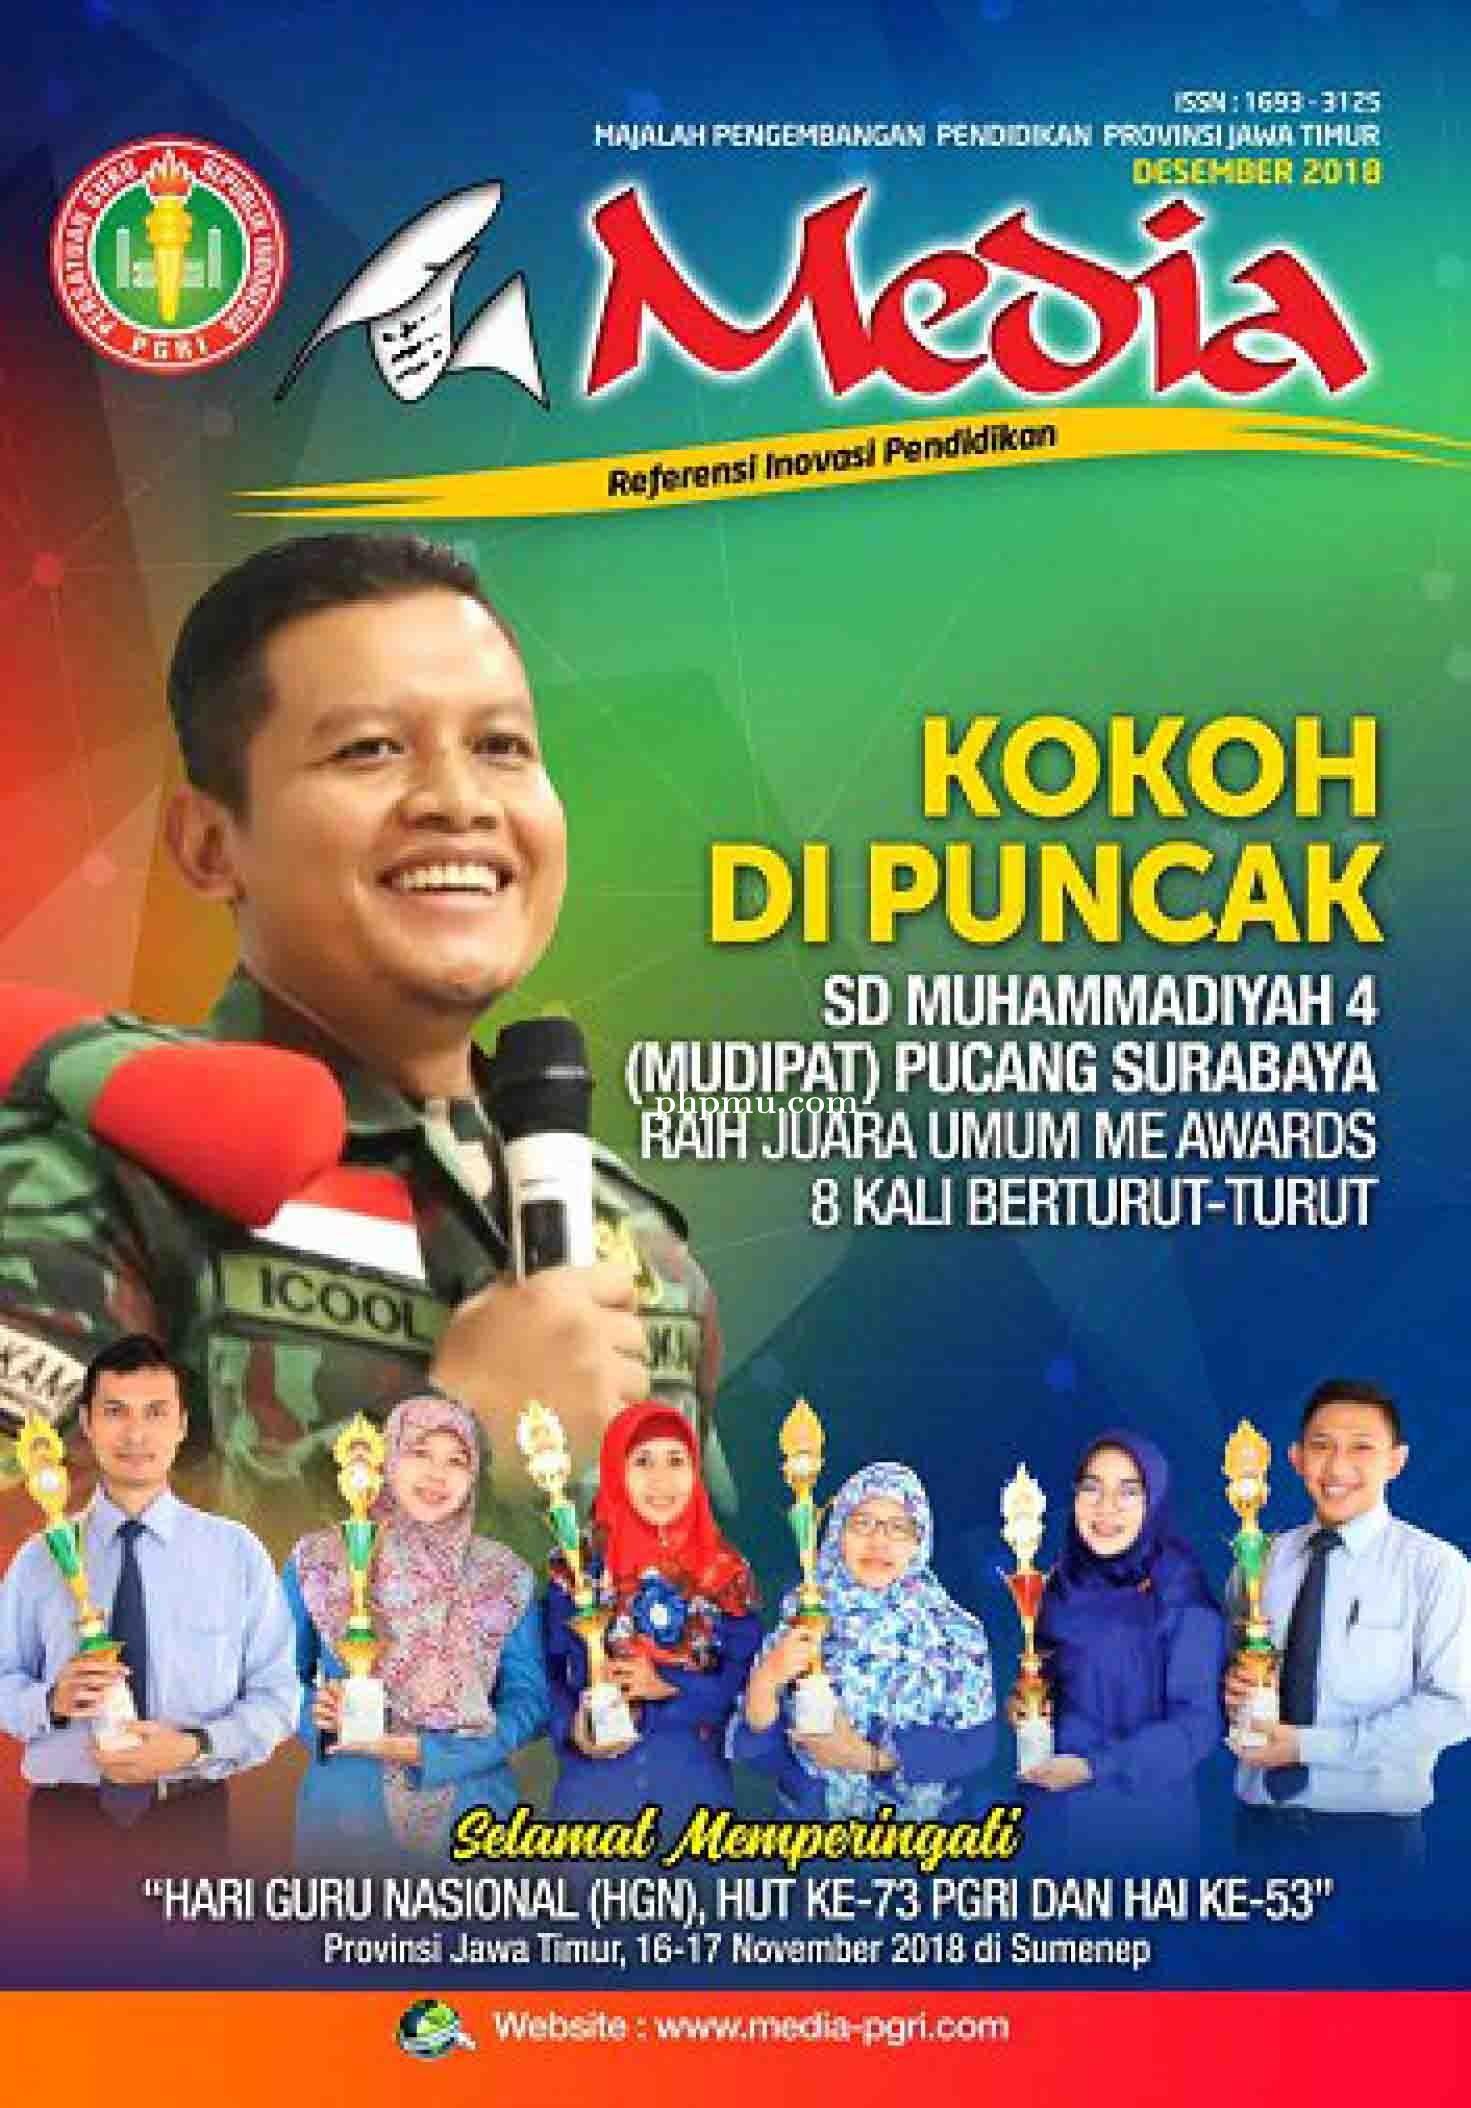 Majalah Media Bulan Desember 2018